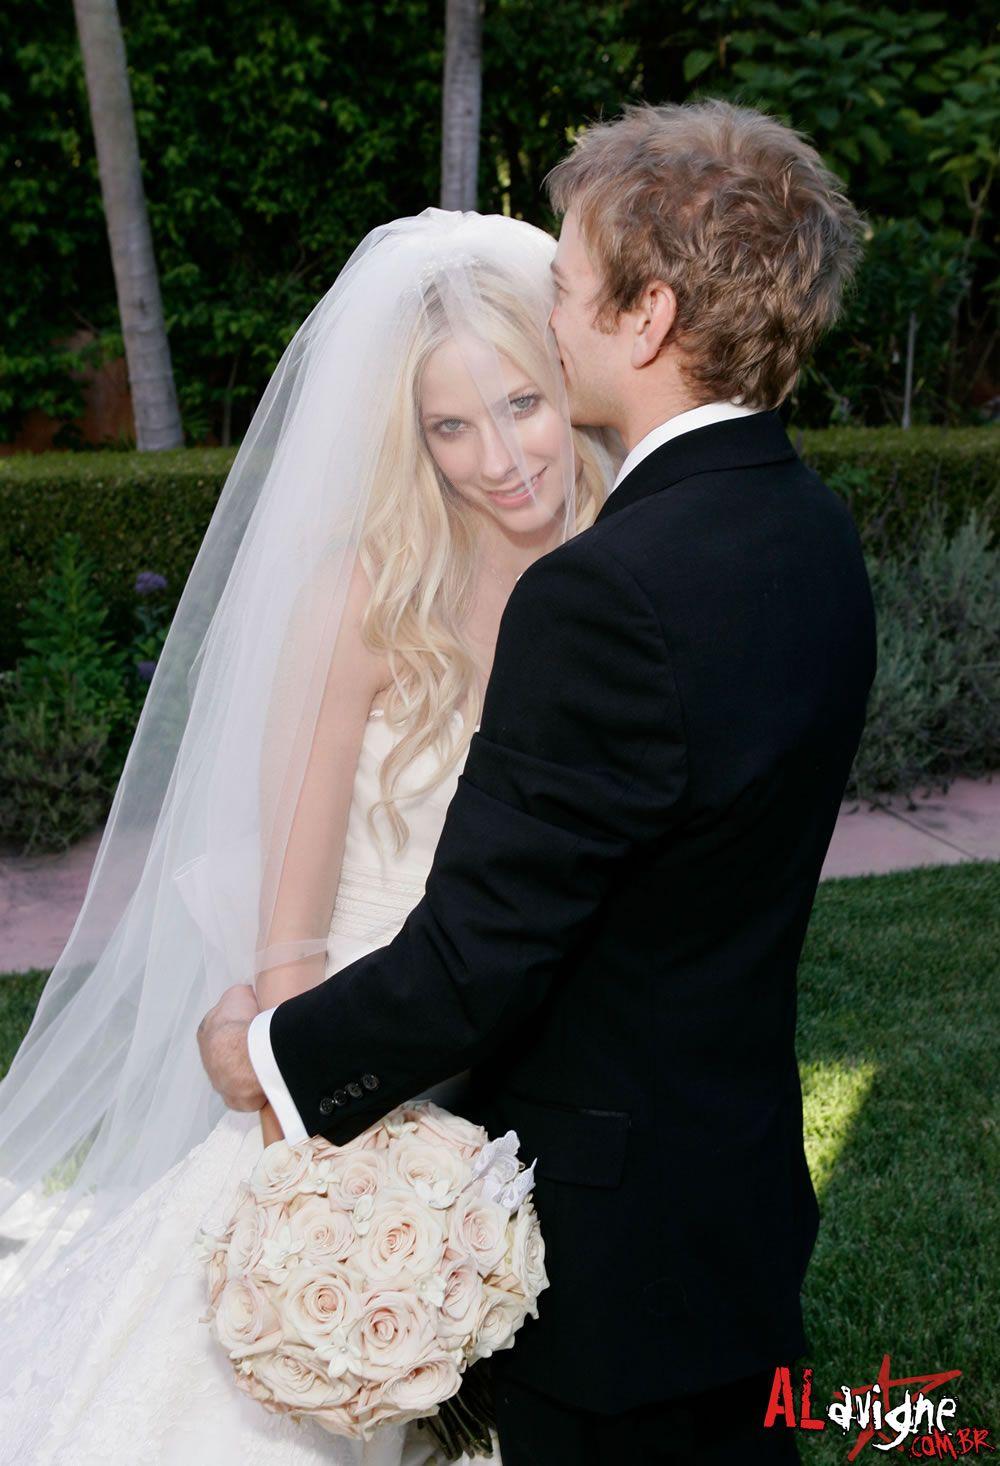 Avril Lavigne Deryck Whibley 2006 Wedding Celebrity Weddings Wedding Dresses